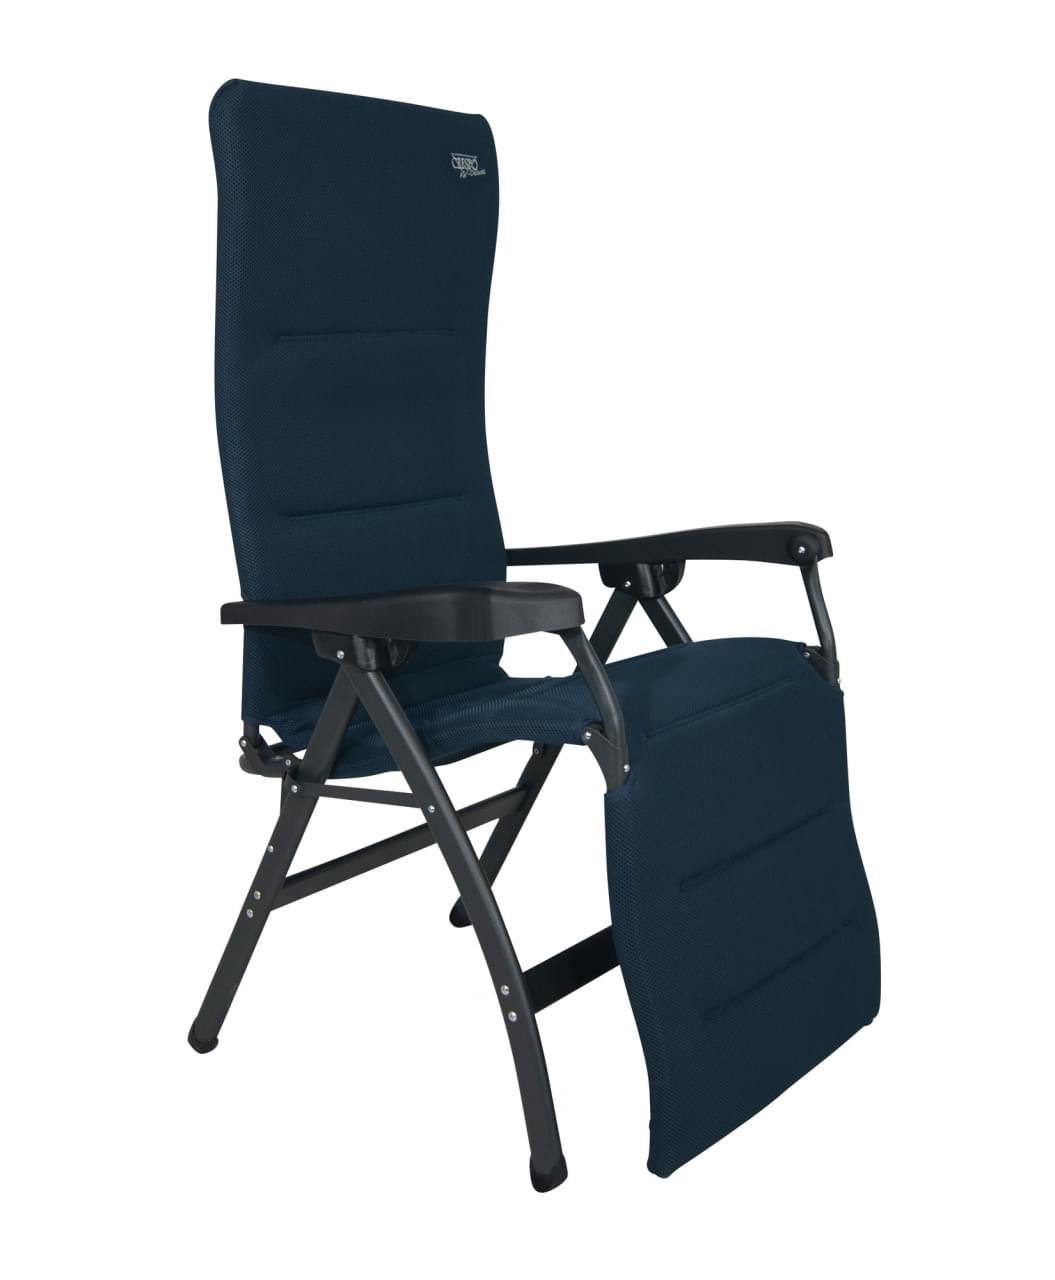 Crespo AP 242 Air deLuxe Relaxstoel Blauw